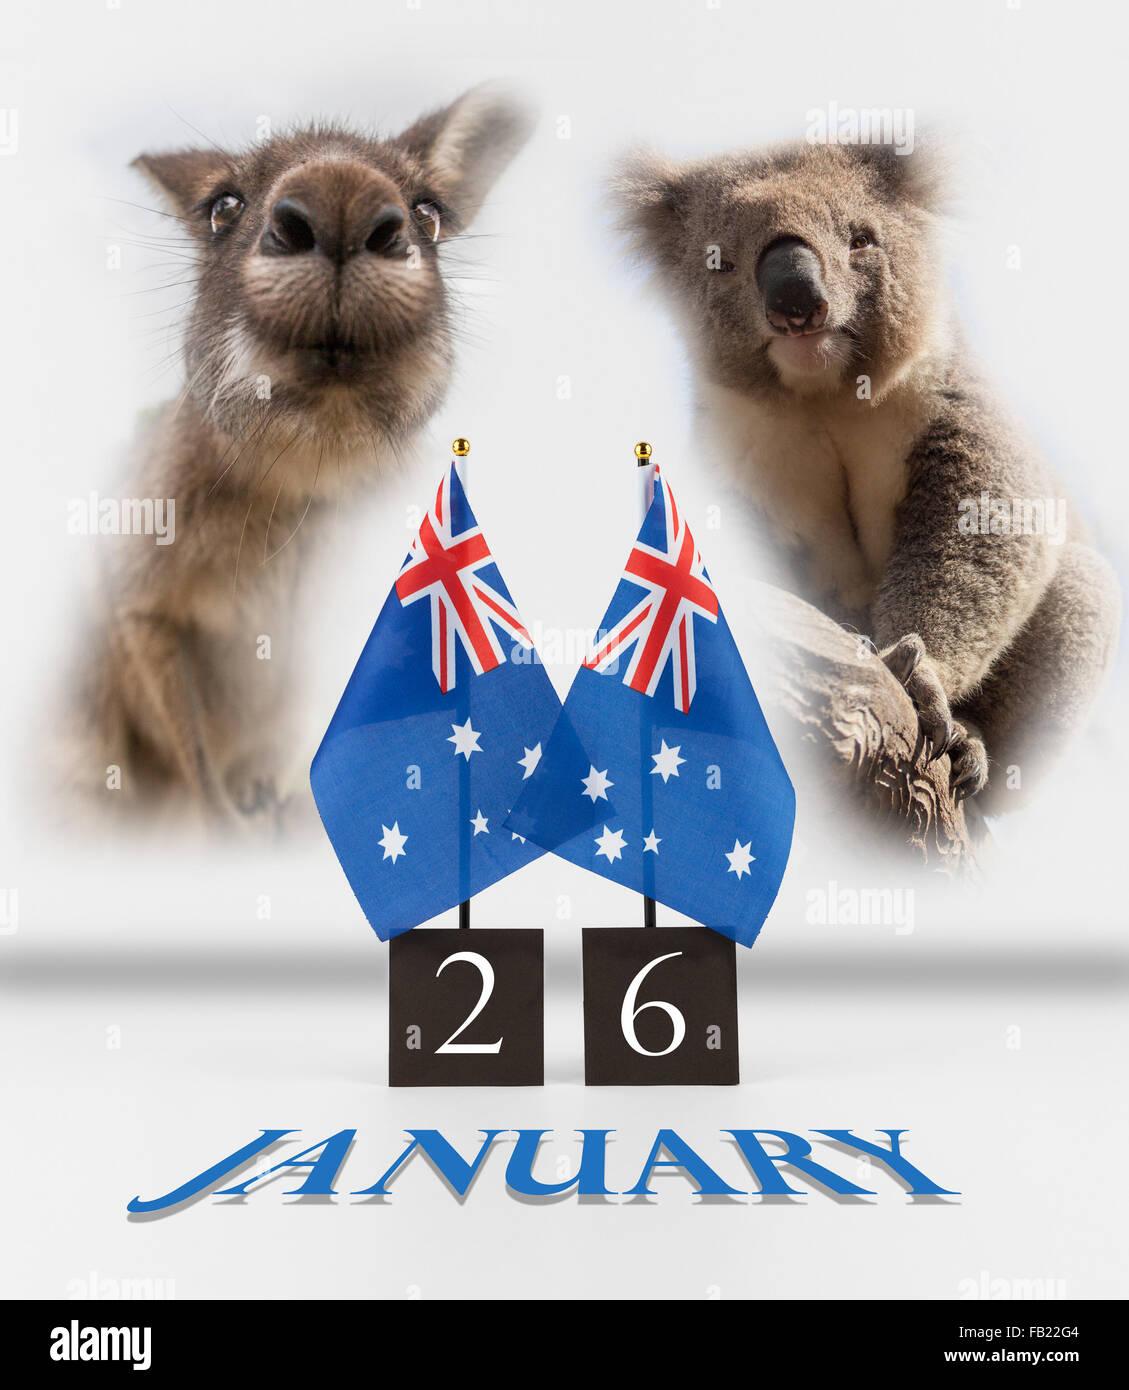 Two australian desk flags koala and kangaroo 26 january australia two australian desk flags koala and kangaroo 26 january australia day greetings symbols isolated on white m4hsunfo